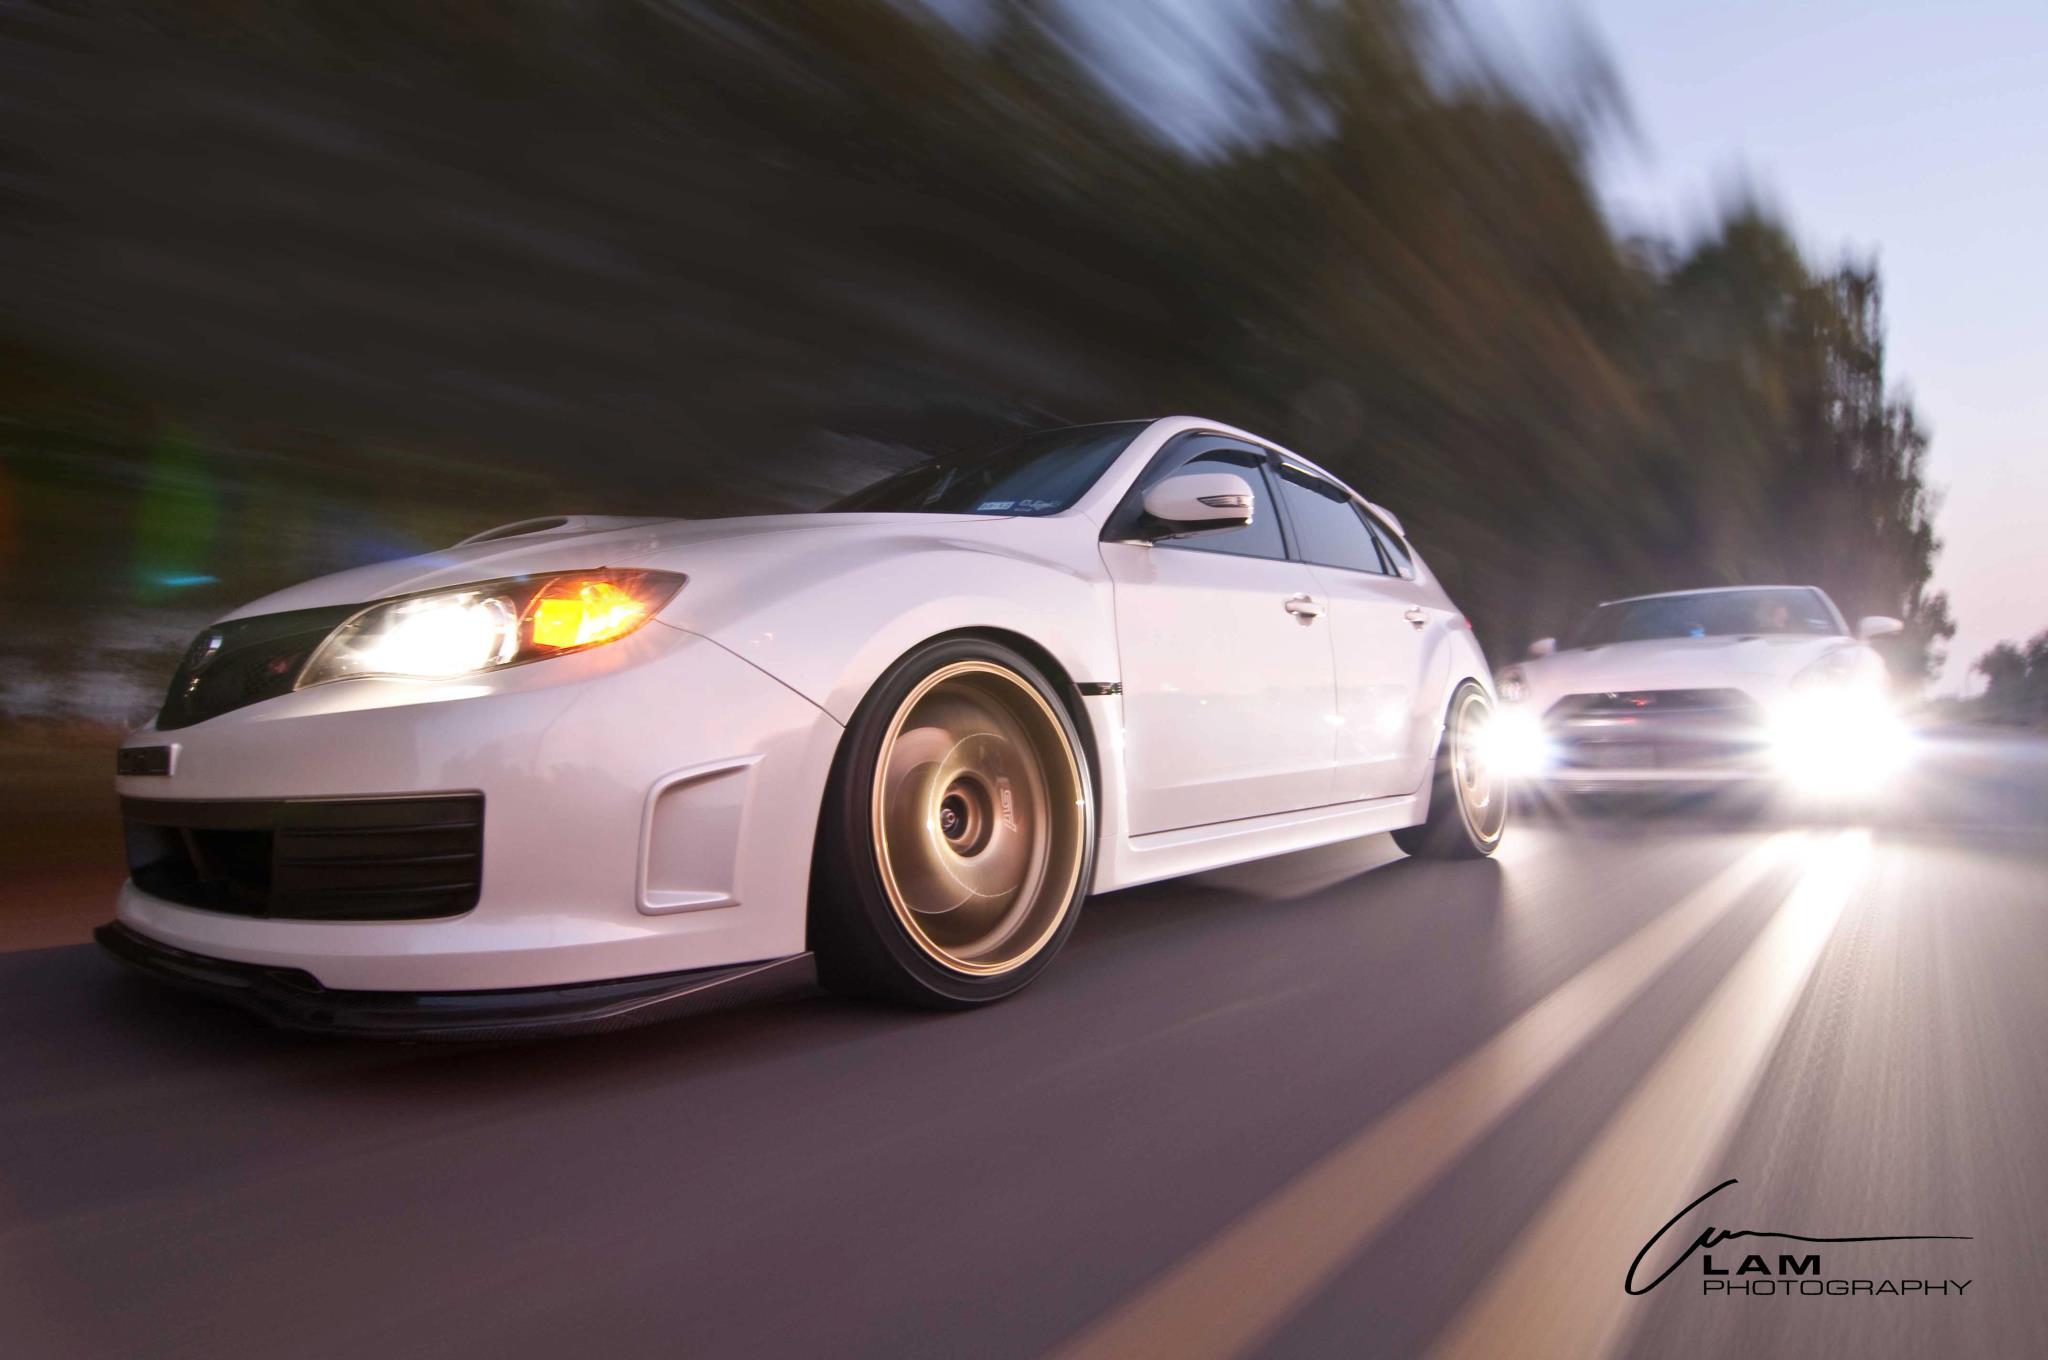 AJ's 2010 SWP STi, to be sold soon, 2013 GT-R on the way!-338501_10150345234501259_684936258_10214502_3548595_o-jpg